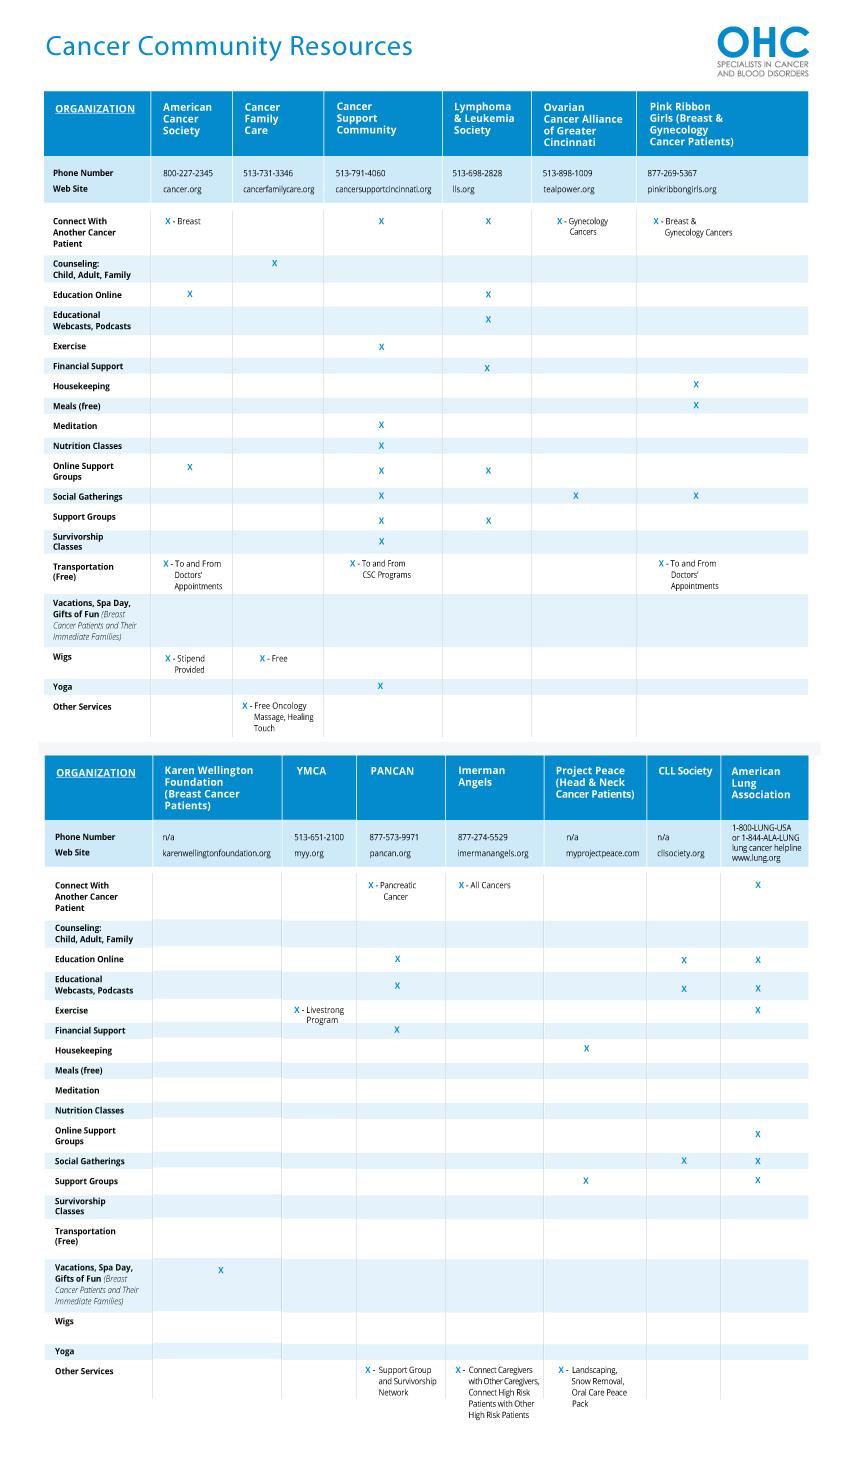 OHC community resources